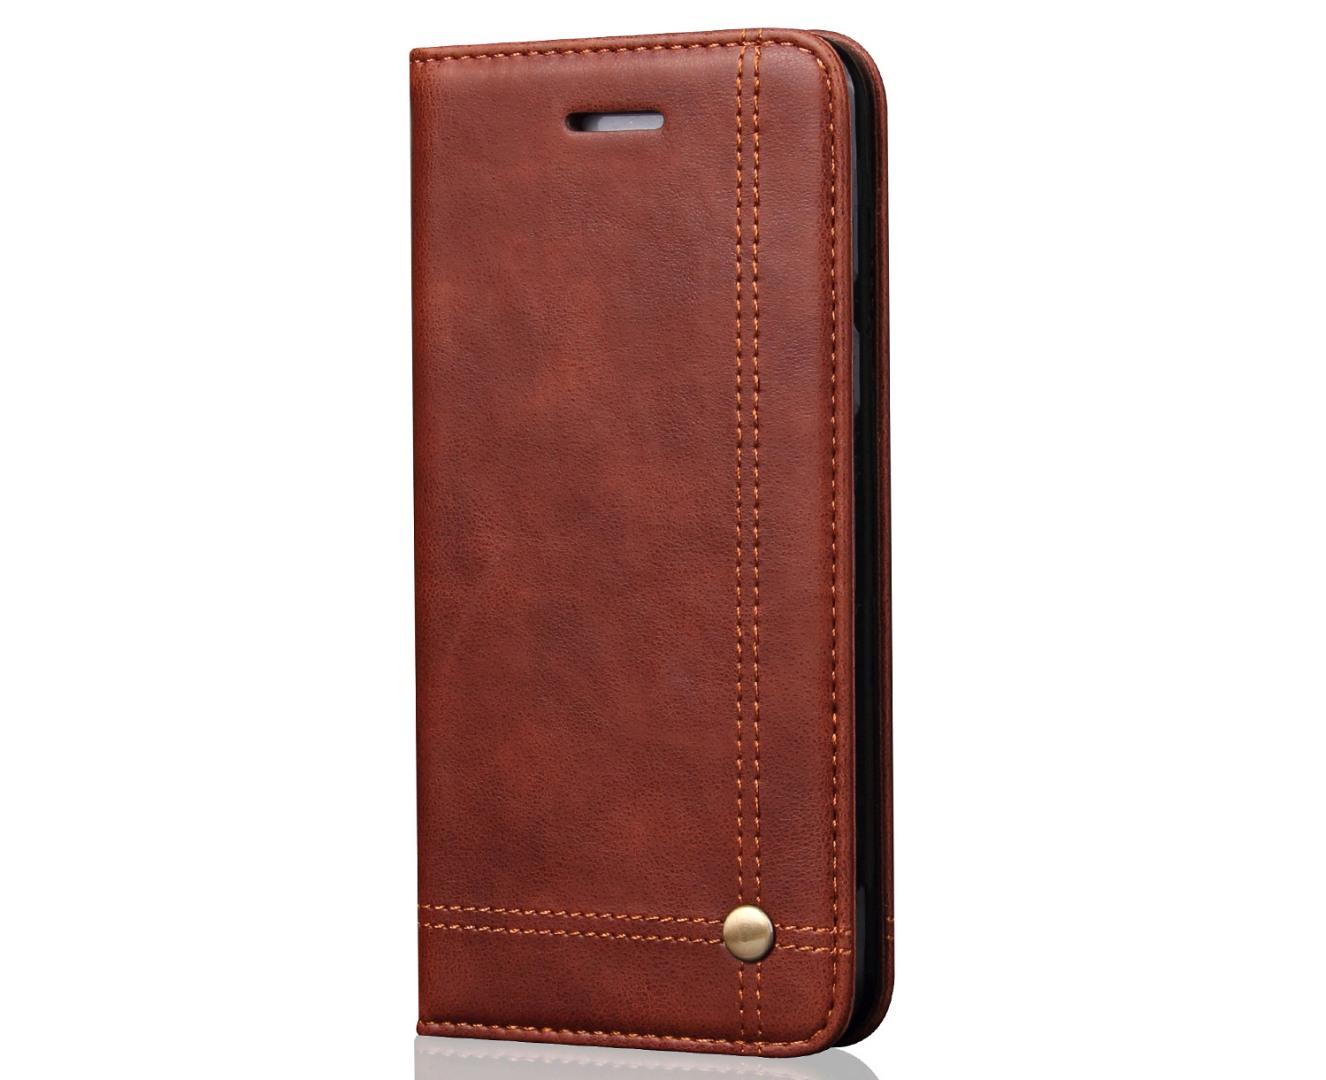 Husa piele, tip portofel, cusaturi ornamentale, stand, inchidere magnetica, iPhone SE (1st gen. 2016), iPhone 5 / 5S - CaseMe, Maro coffee